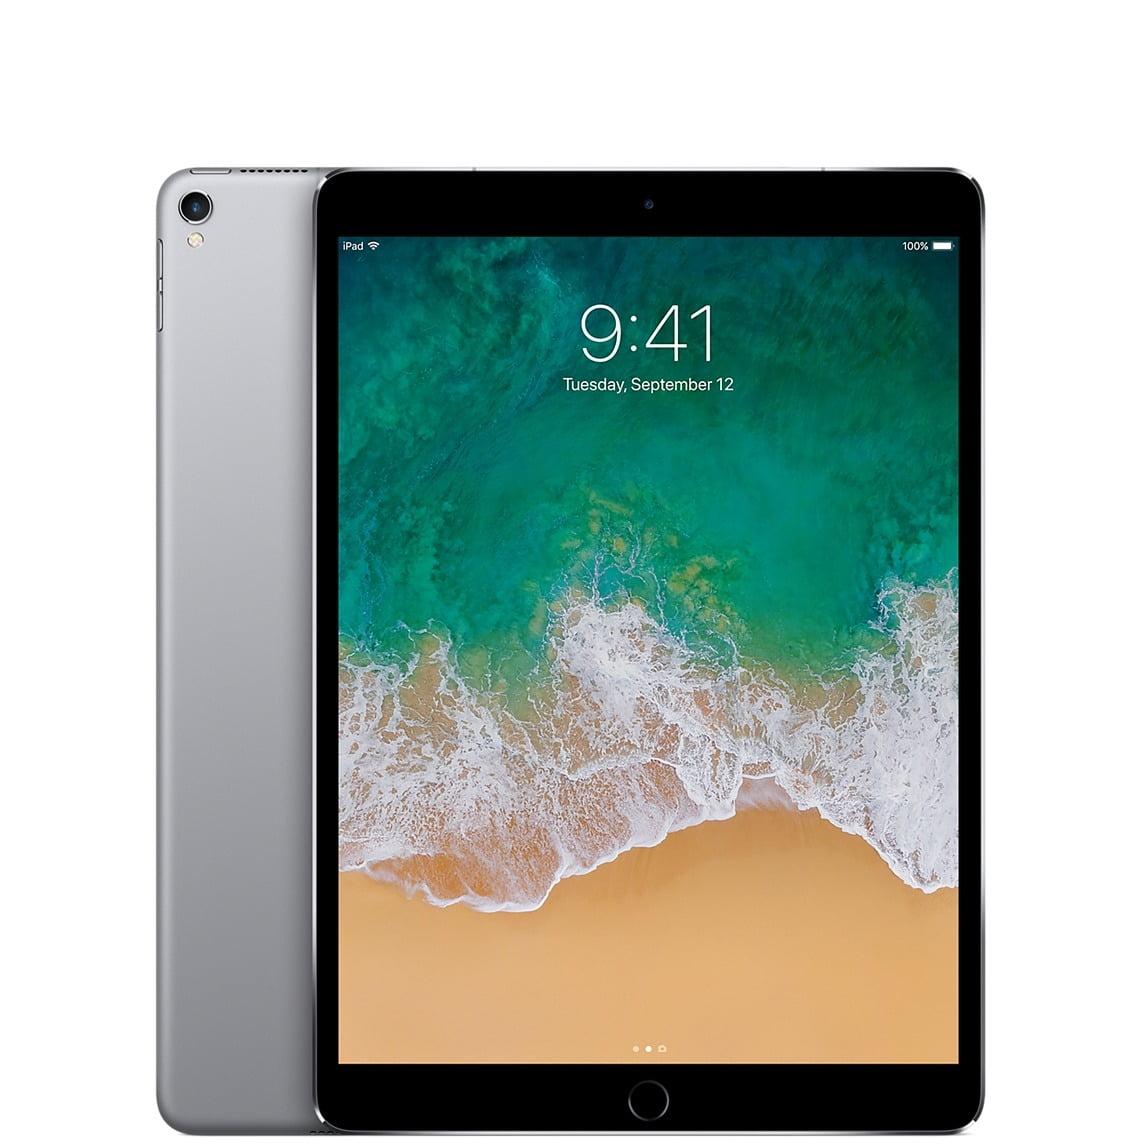 10.5 ipad pro space grey